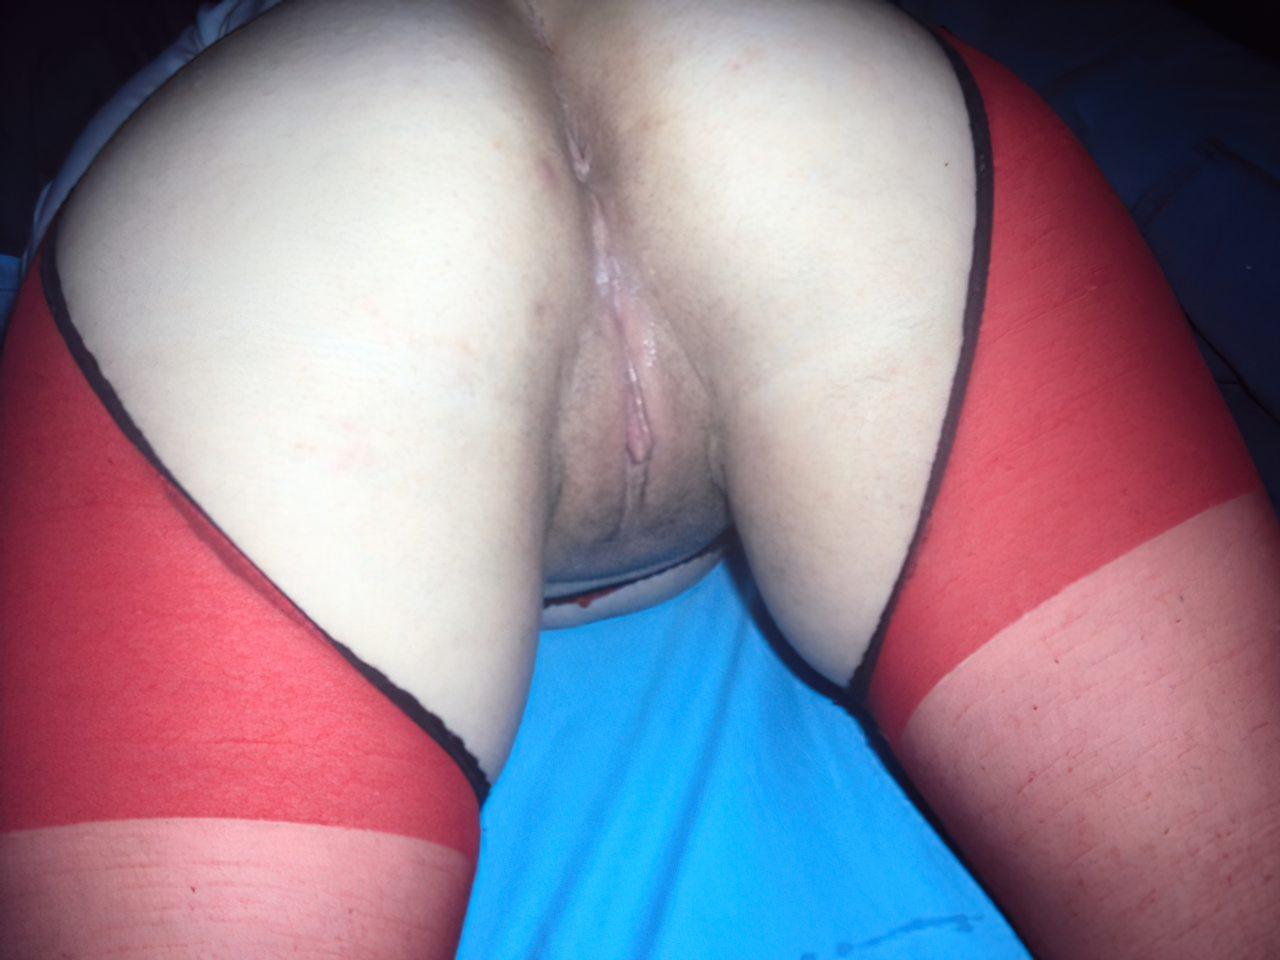 Esposa se Mostrando (37)